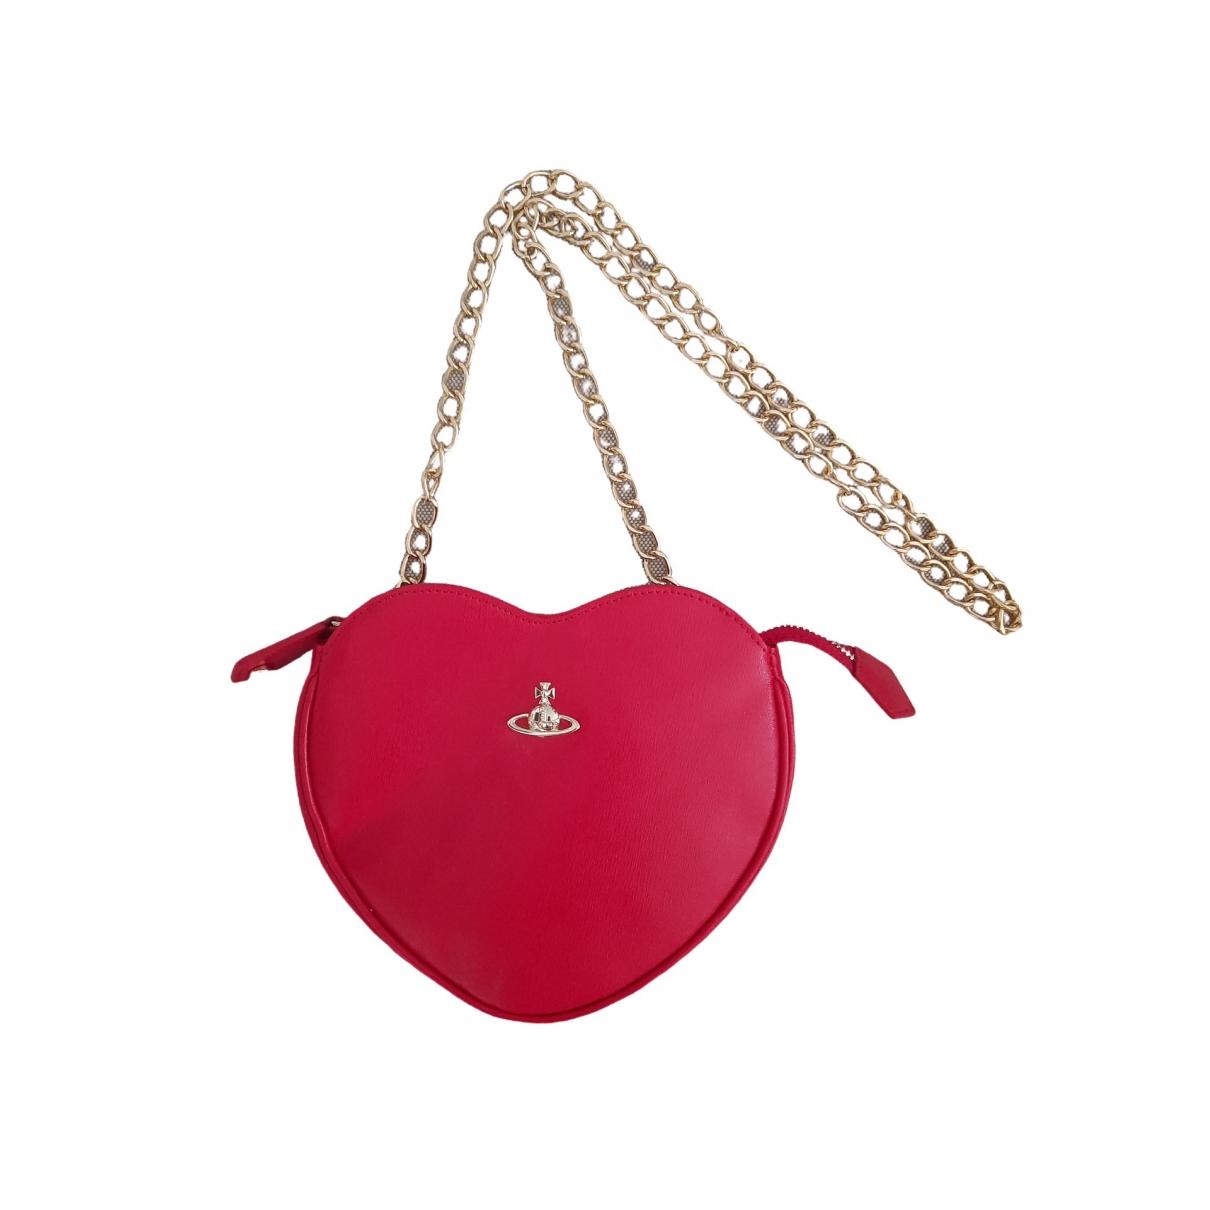 Vivienne Westwood \N Red Leather Clutch bag for Women \N